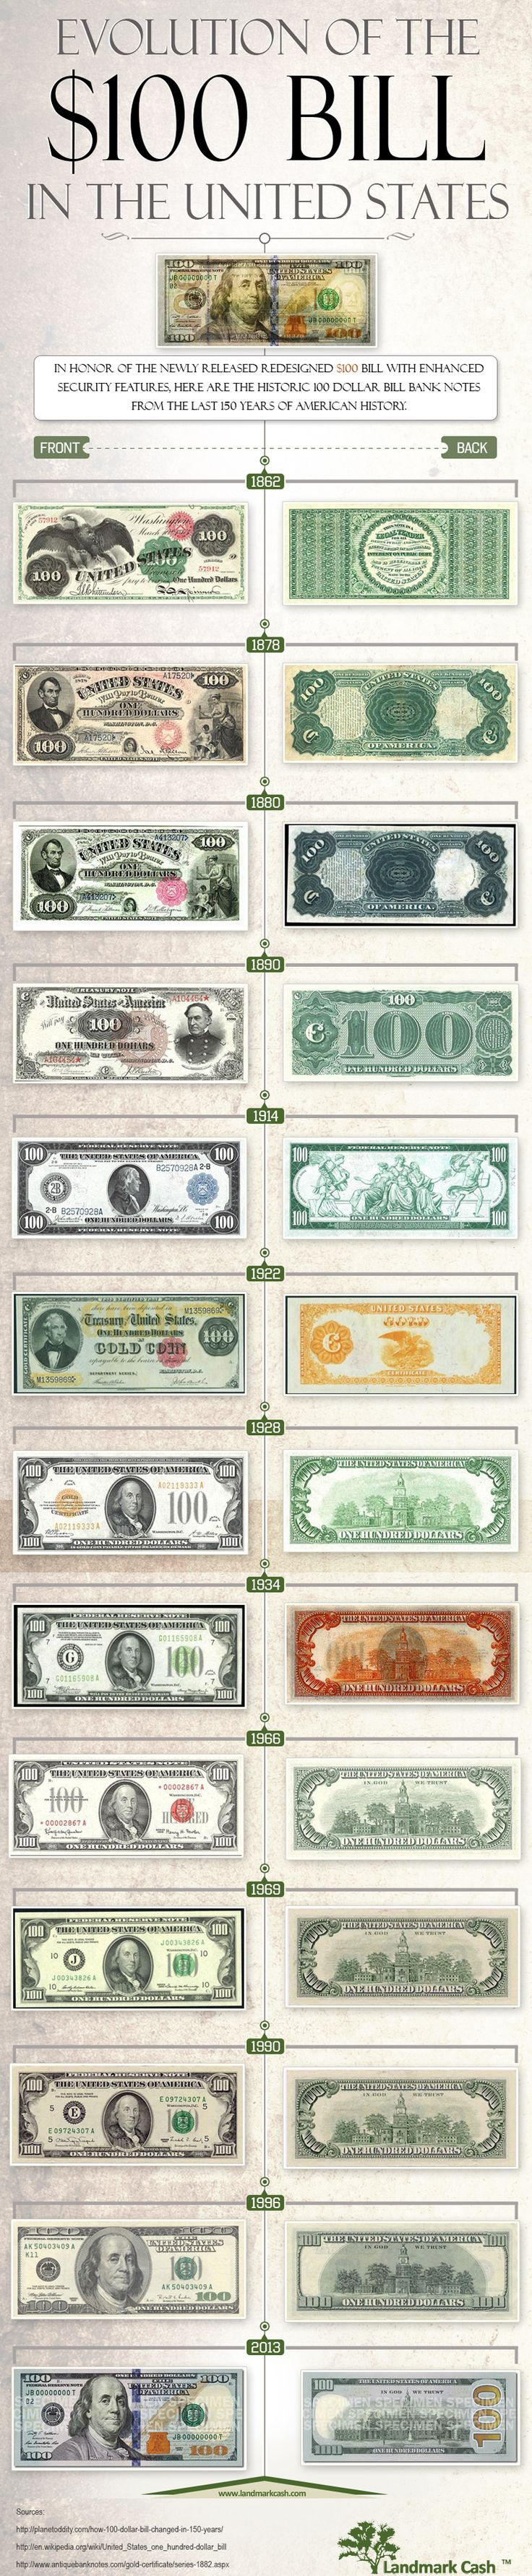 Evolution of the $100 Bill in the United States [Infographic]  http://www.landmarkcash.com/100-dollar-bill.html